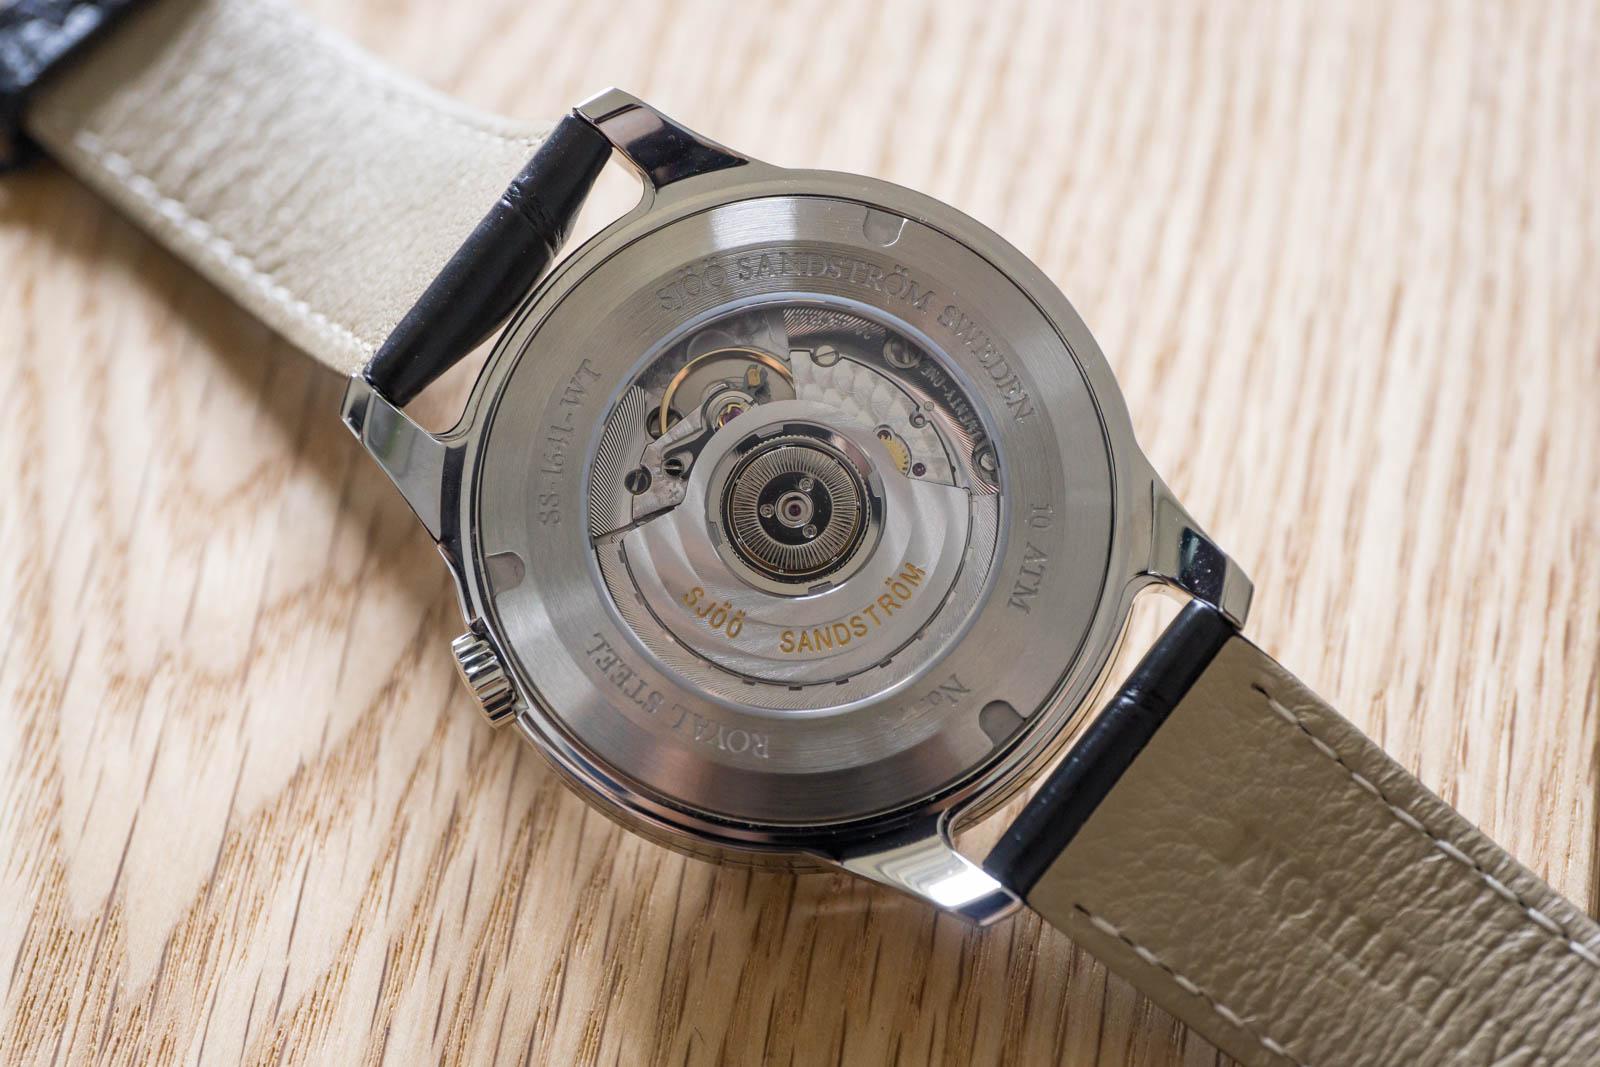 sjoo-sandstrom-royal-steel-worldtimer-2931